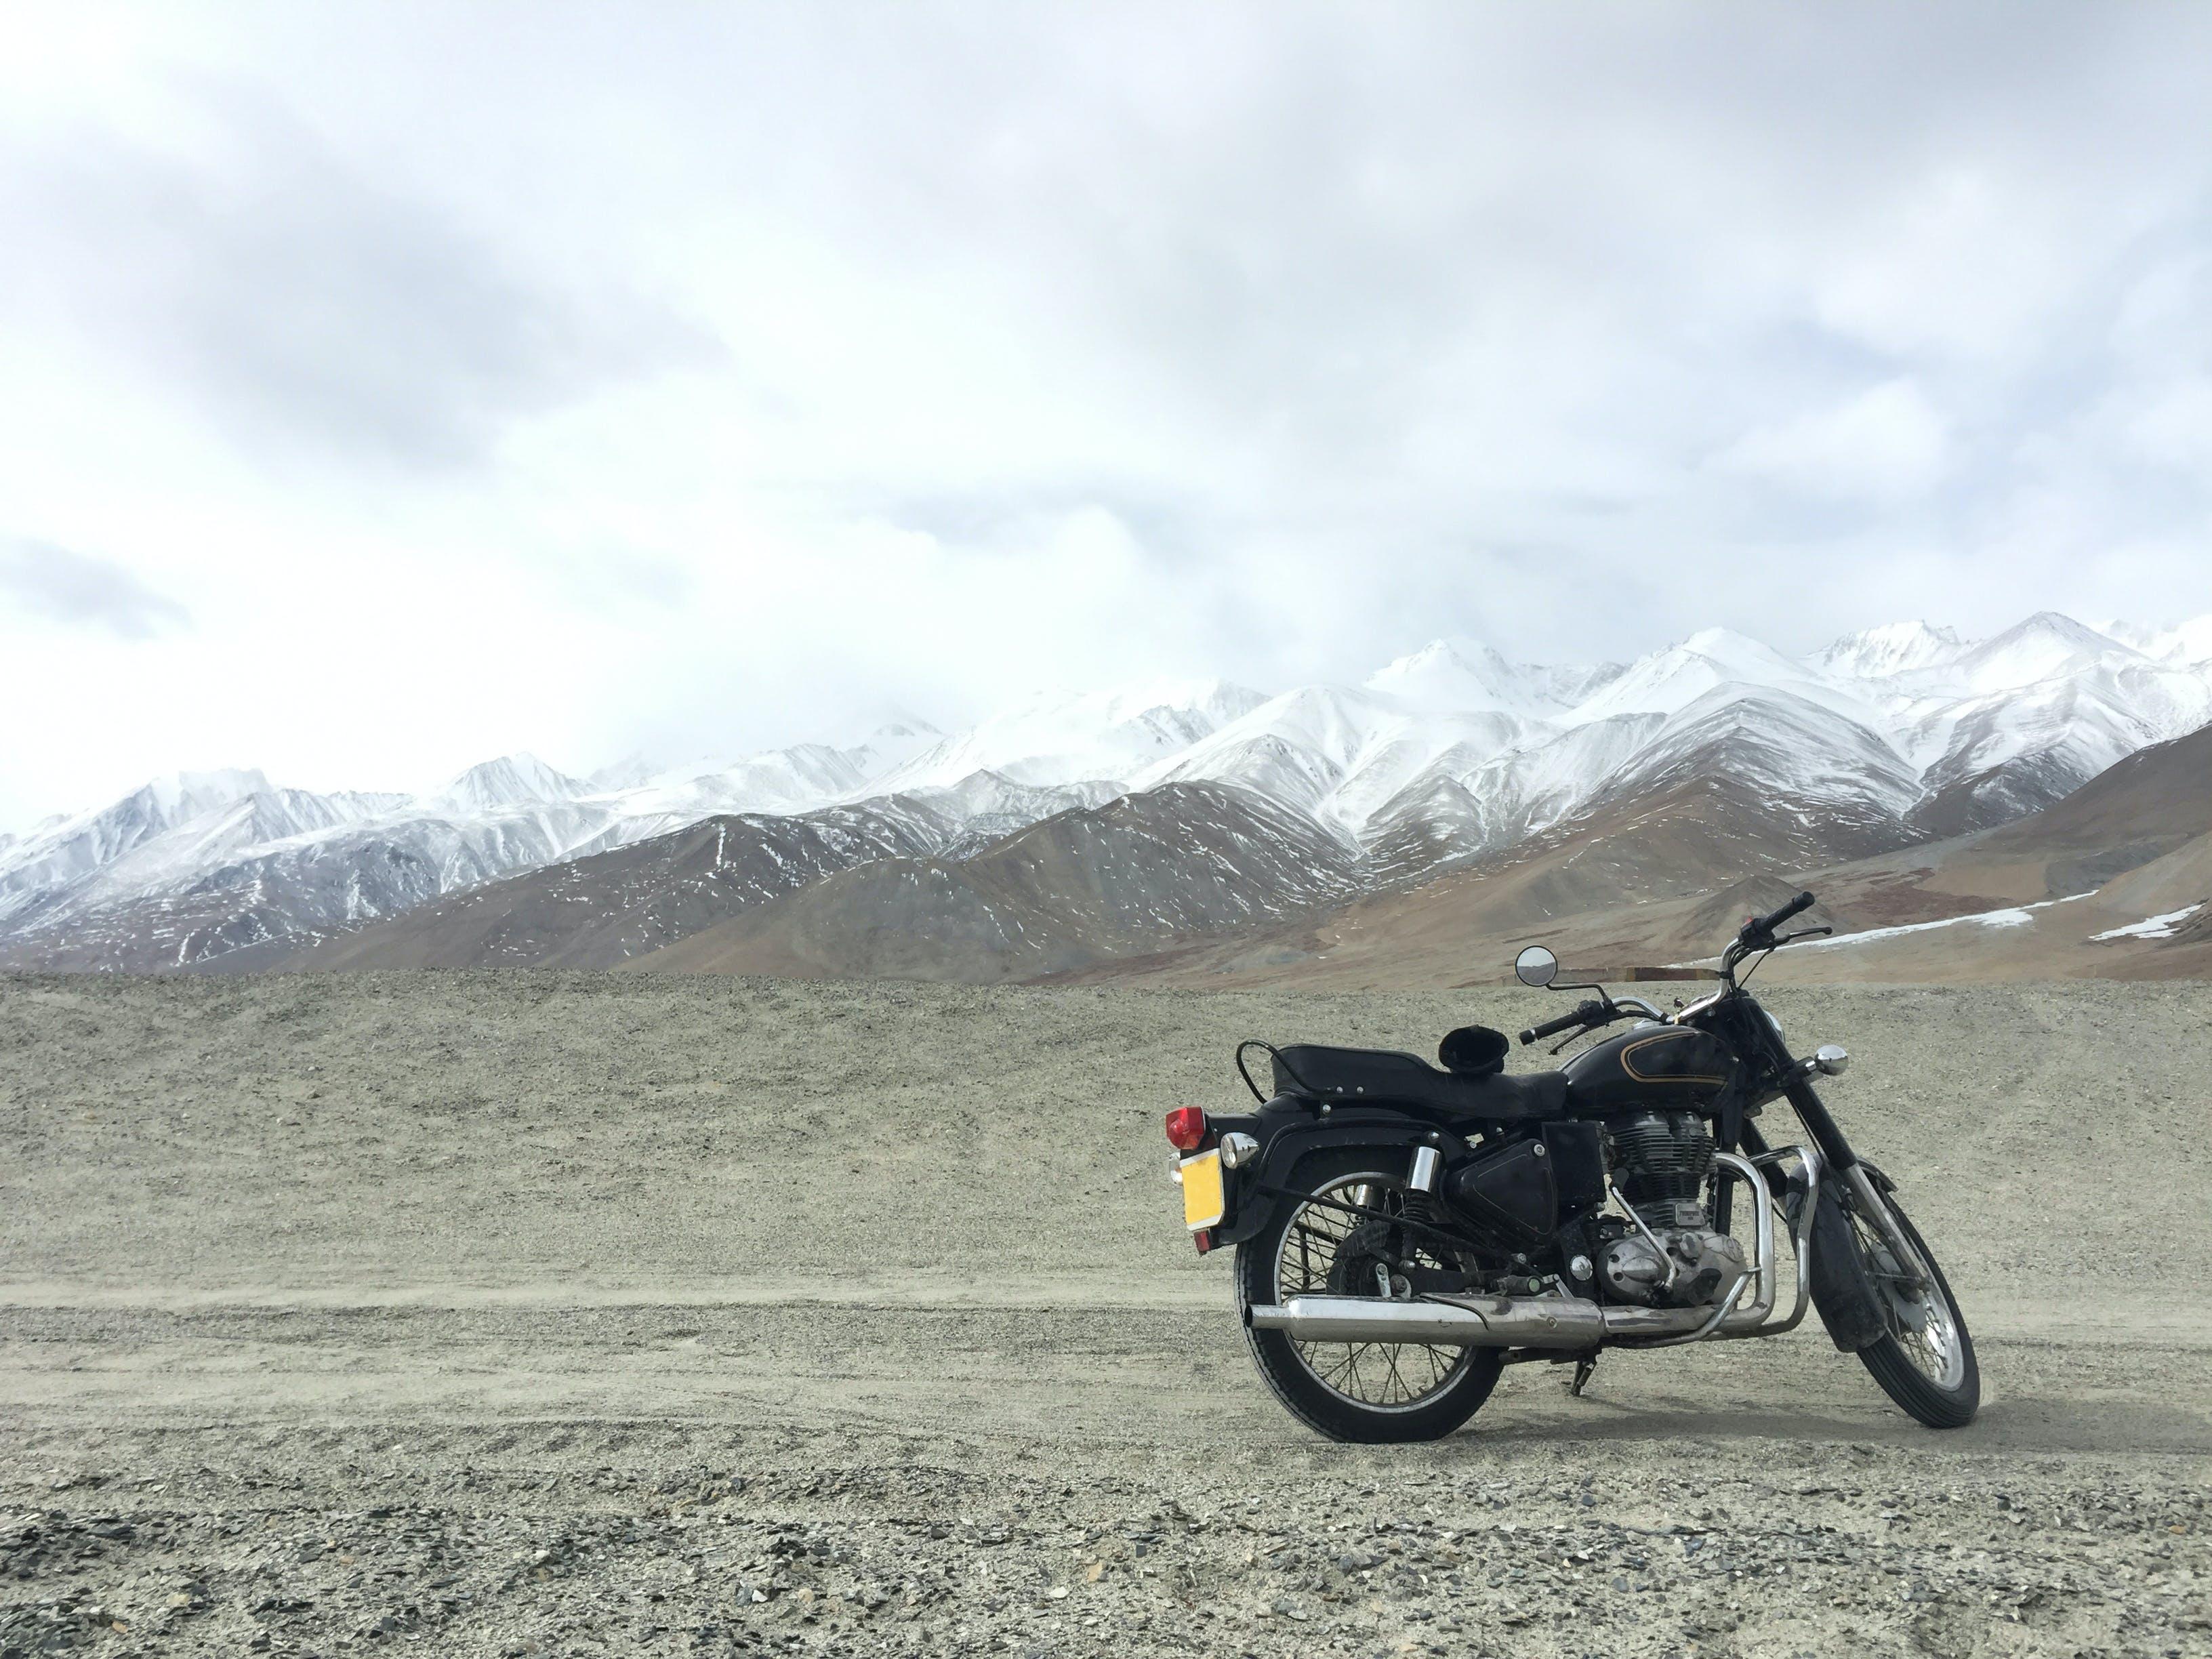 Standard Motorcycle on Ground